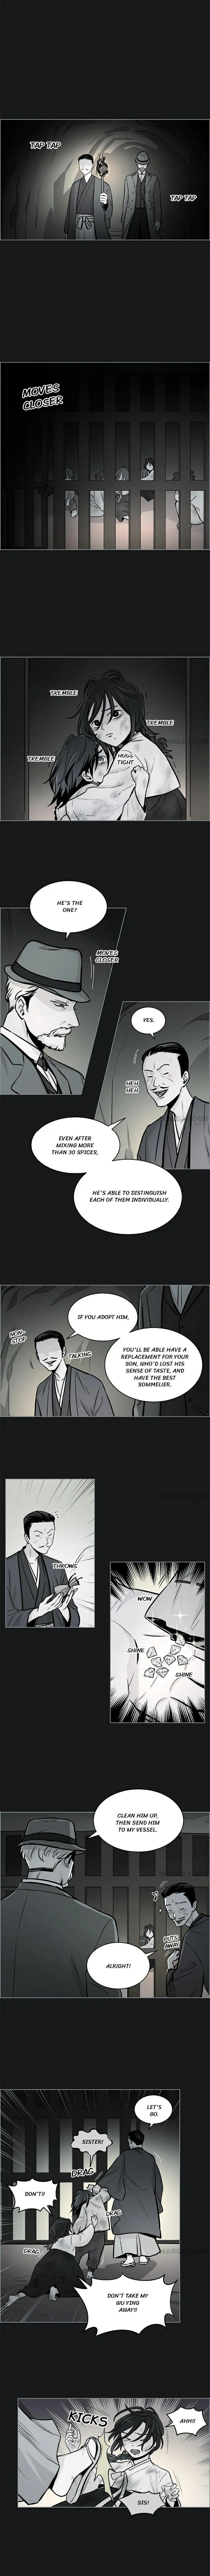 https://img2.nineanime.com/comics/pic2/31/32927/971782/5b18e1a3e2092783aea4b1aa4a894d8a.jpg Page 1